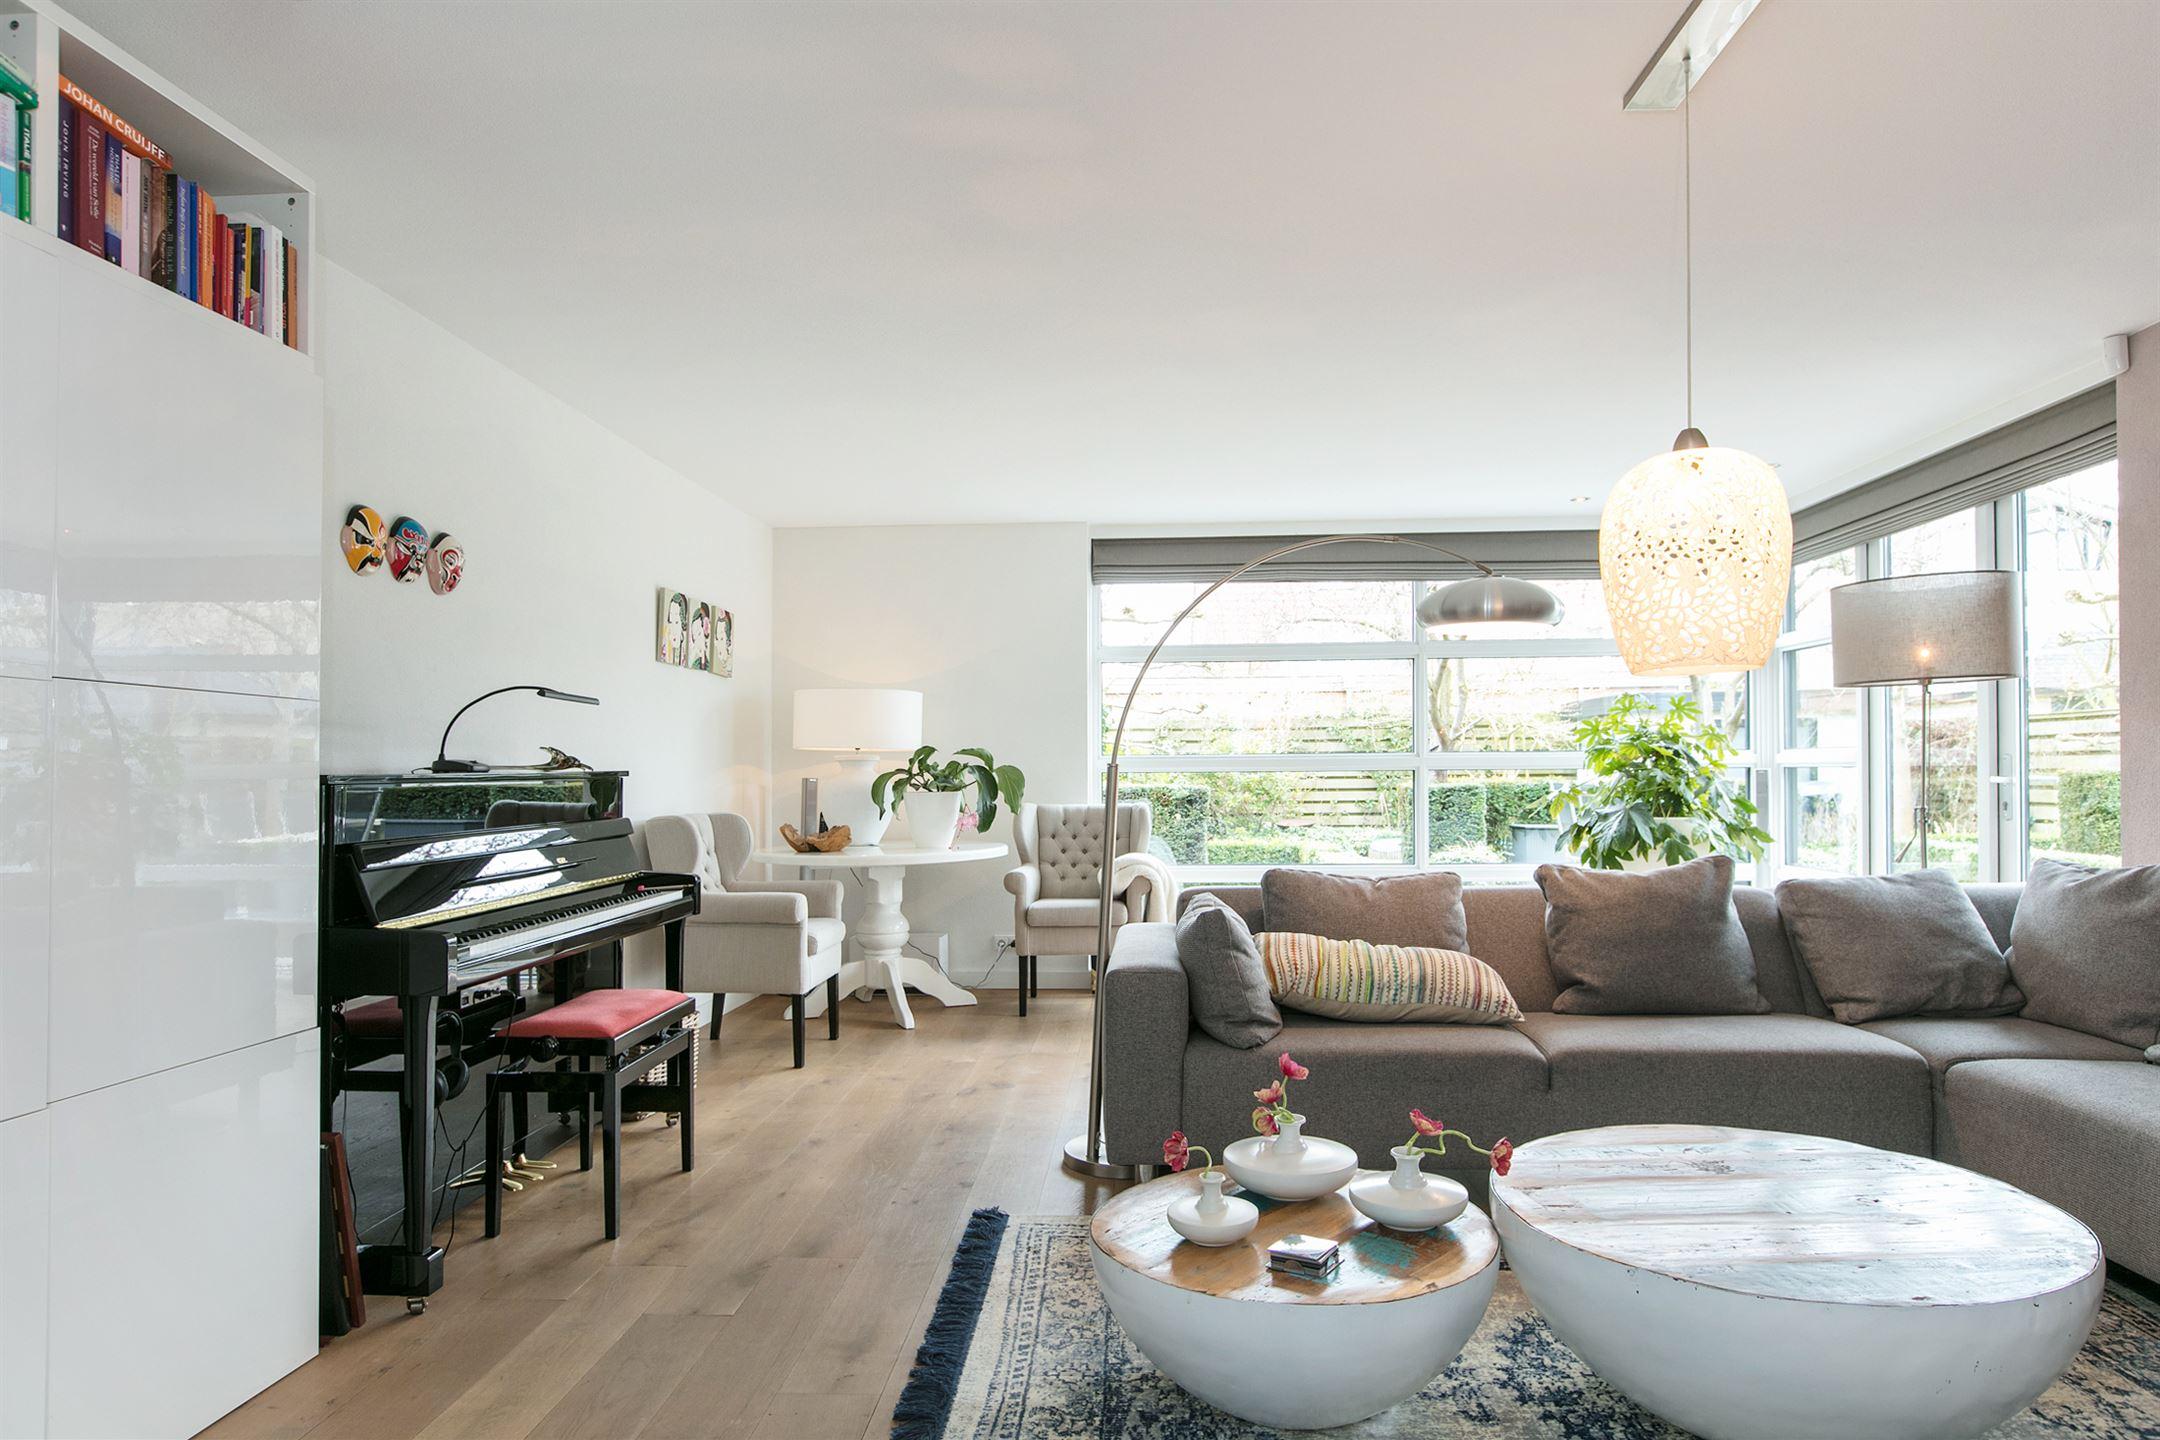 Huis te koop poldermolenlaan 5 7241 vv lochem funda - Huis vv ...